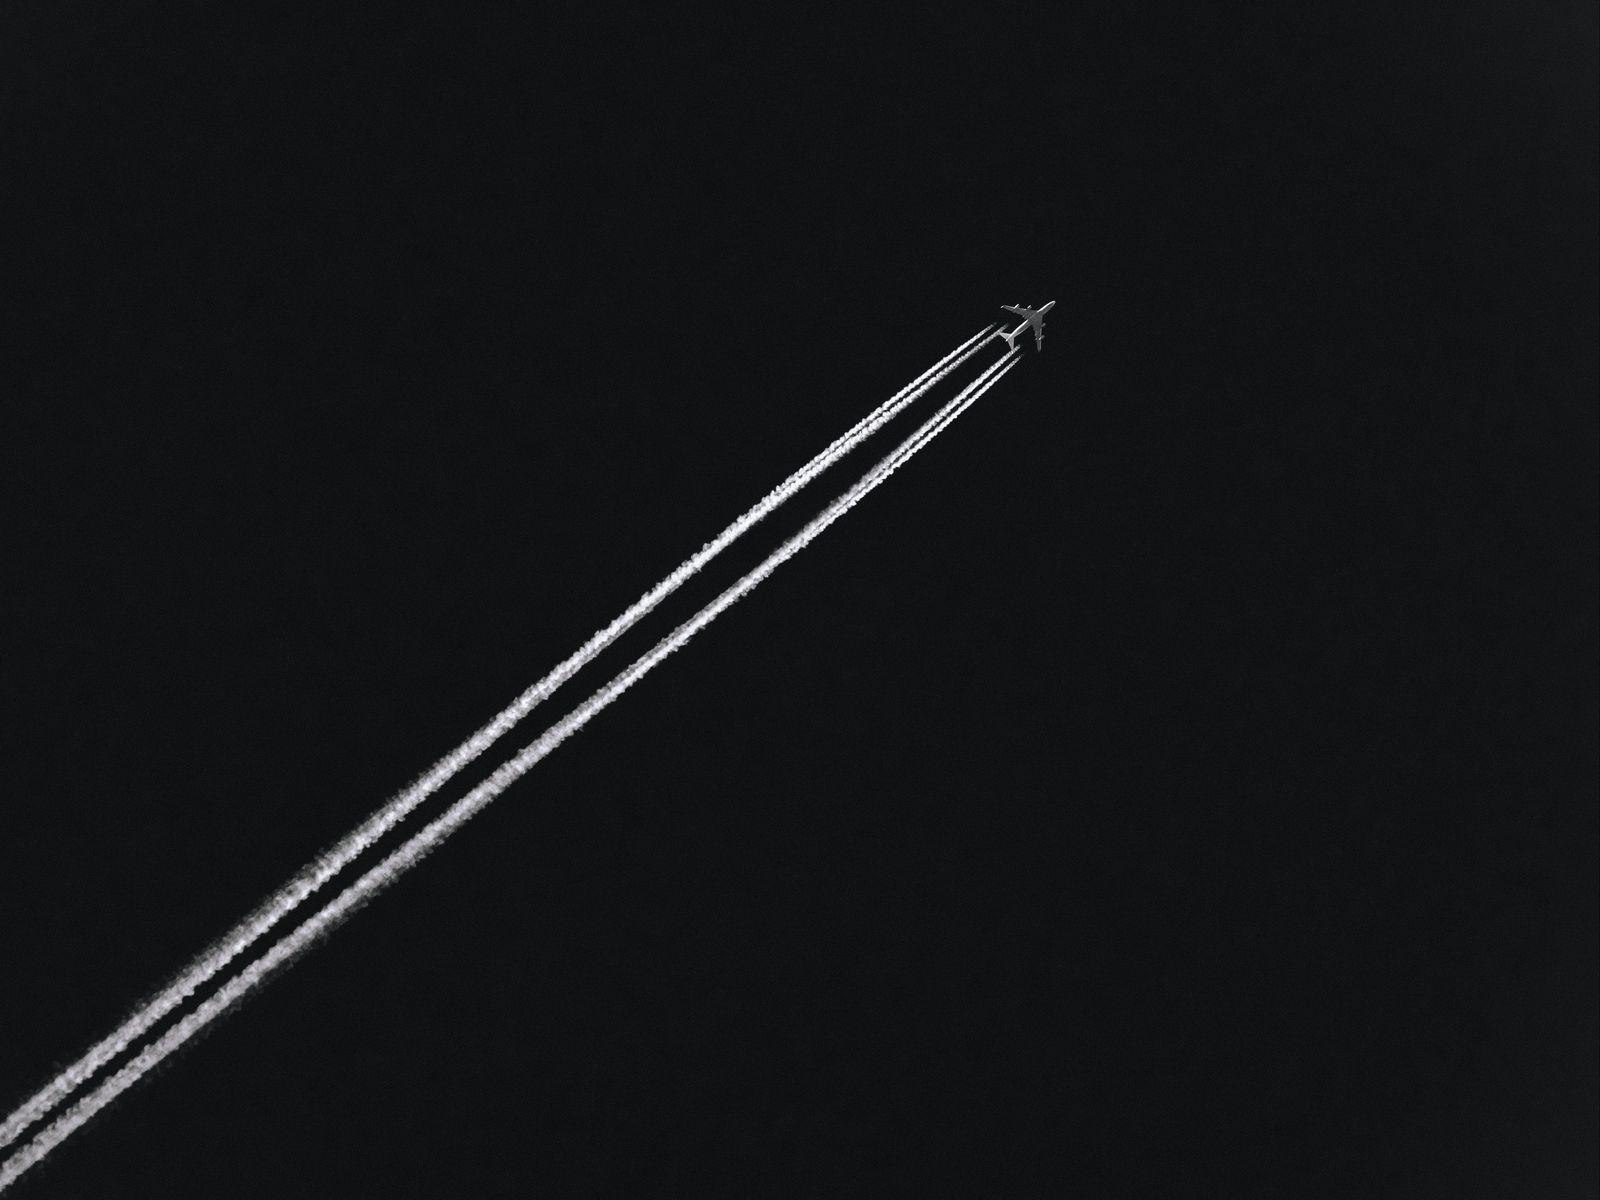 1600x1200 Wallpaper airplane, track, dark, sky